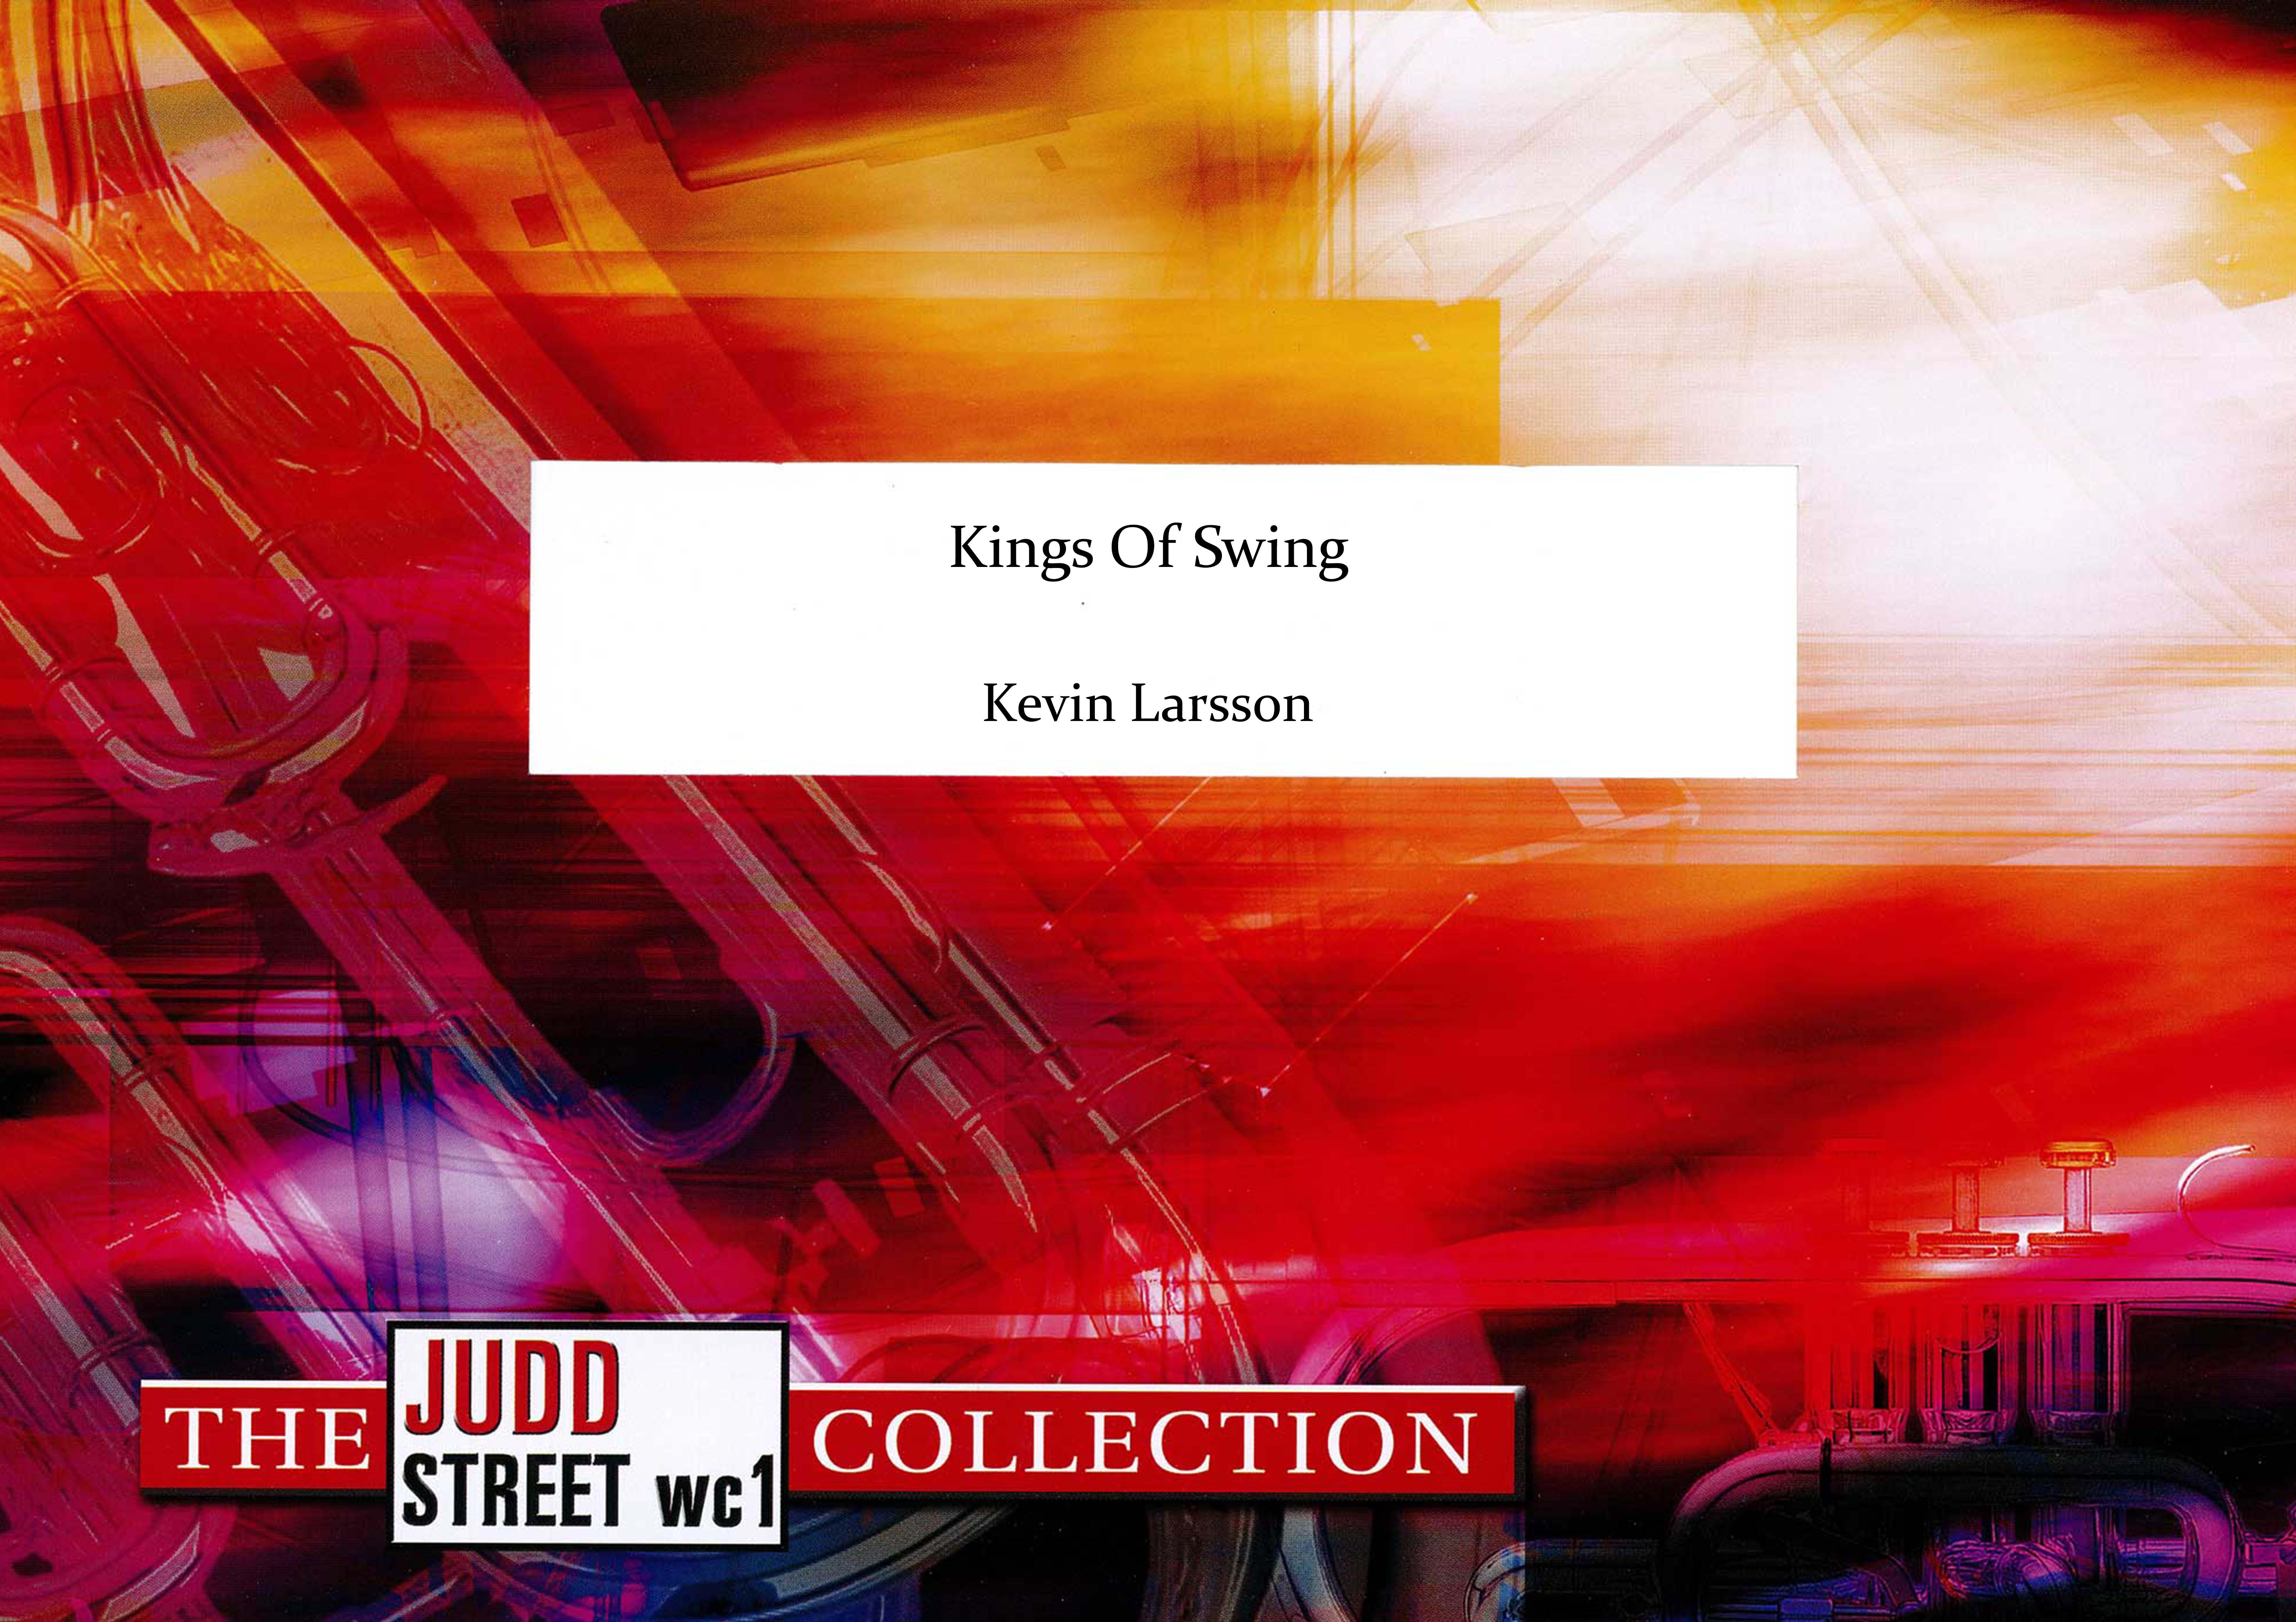 Kings Of Swing (Brass Band - Score only)